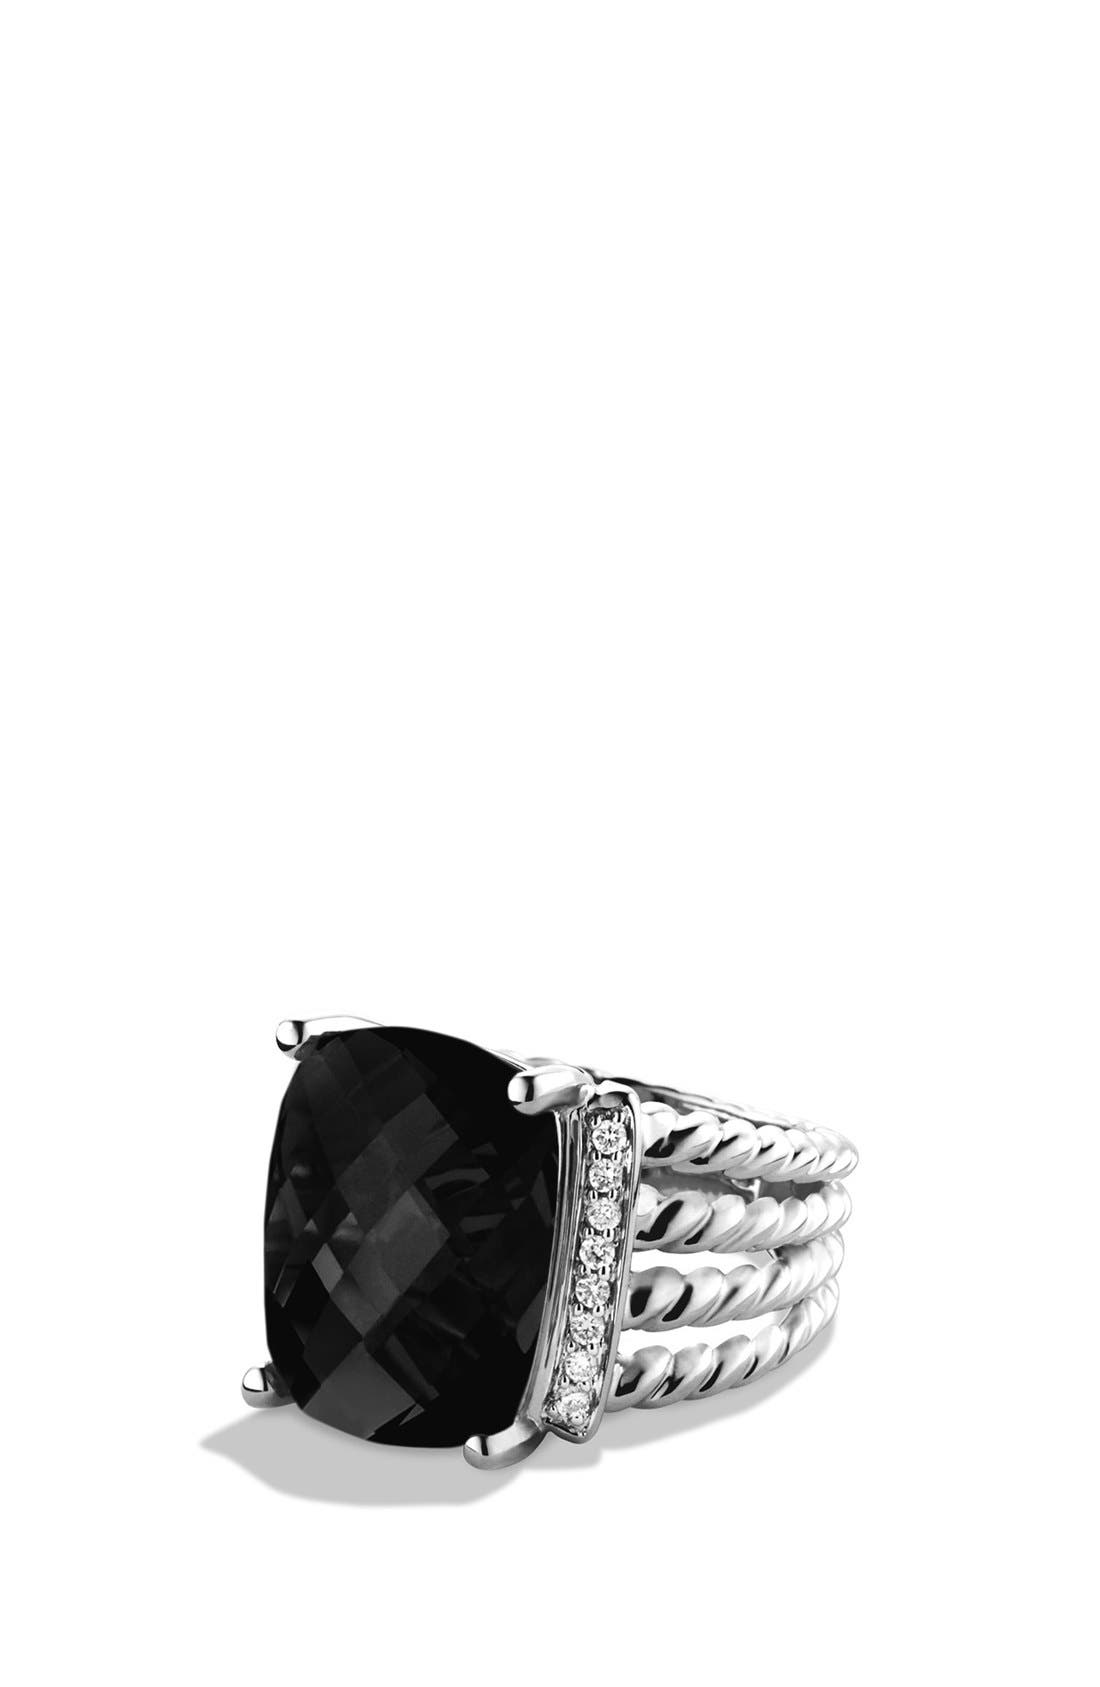 DAVID YURMAN Wheaton Ring with Semiprecious Stone & Diamonds